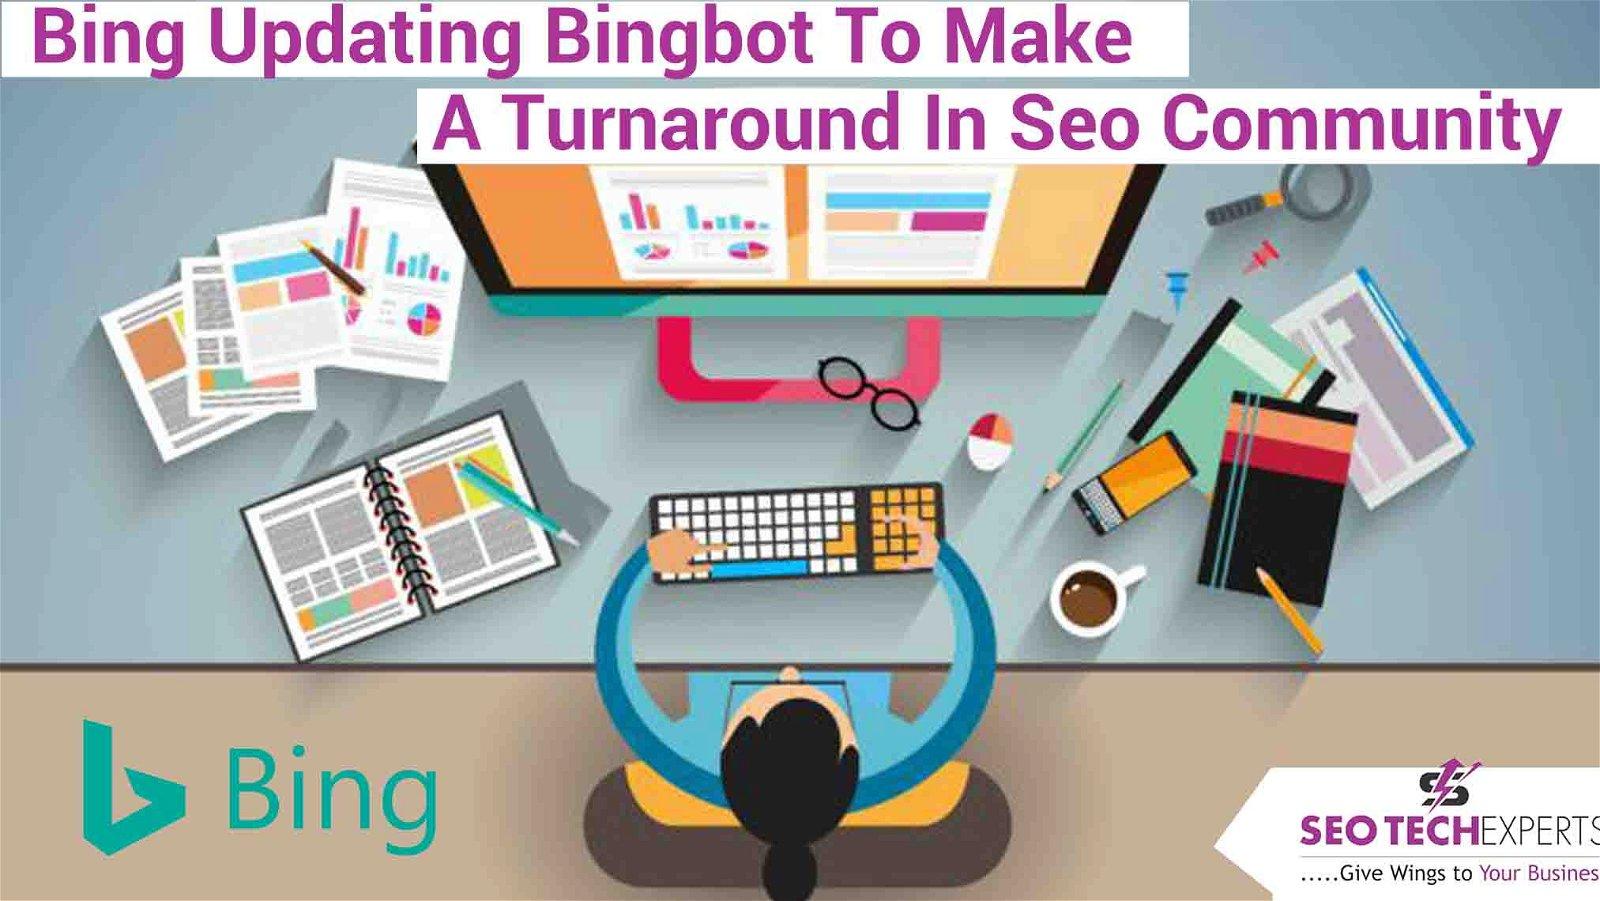 bing updating BingBot